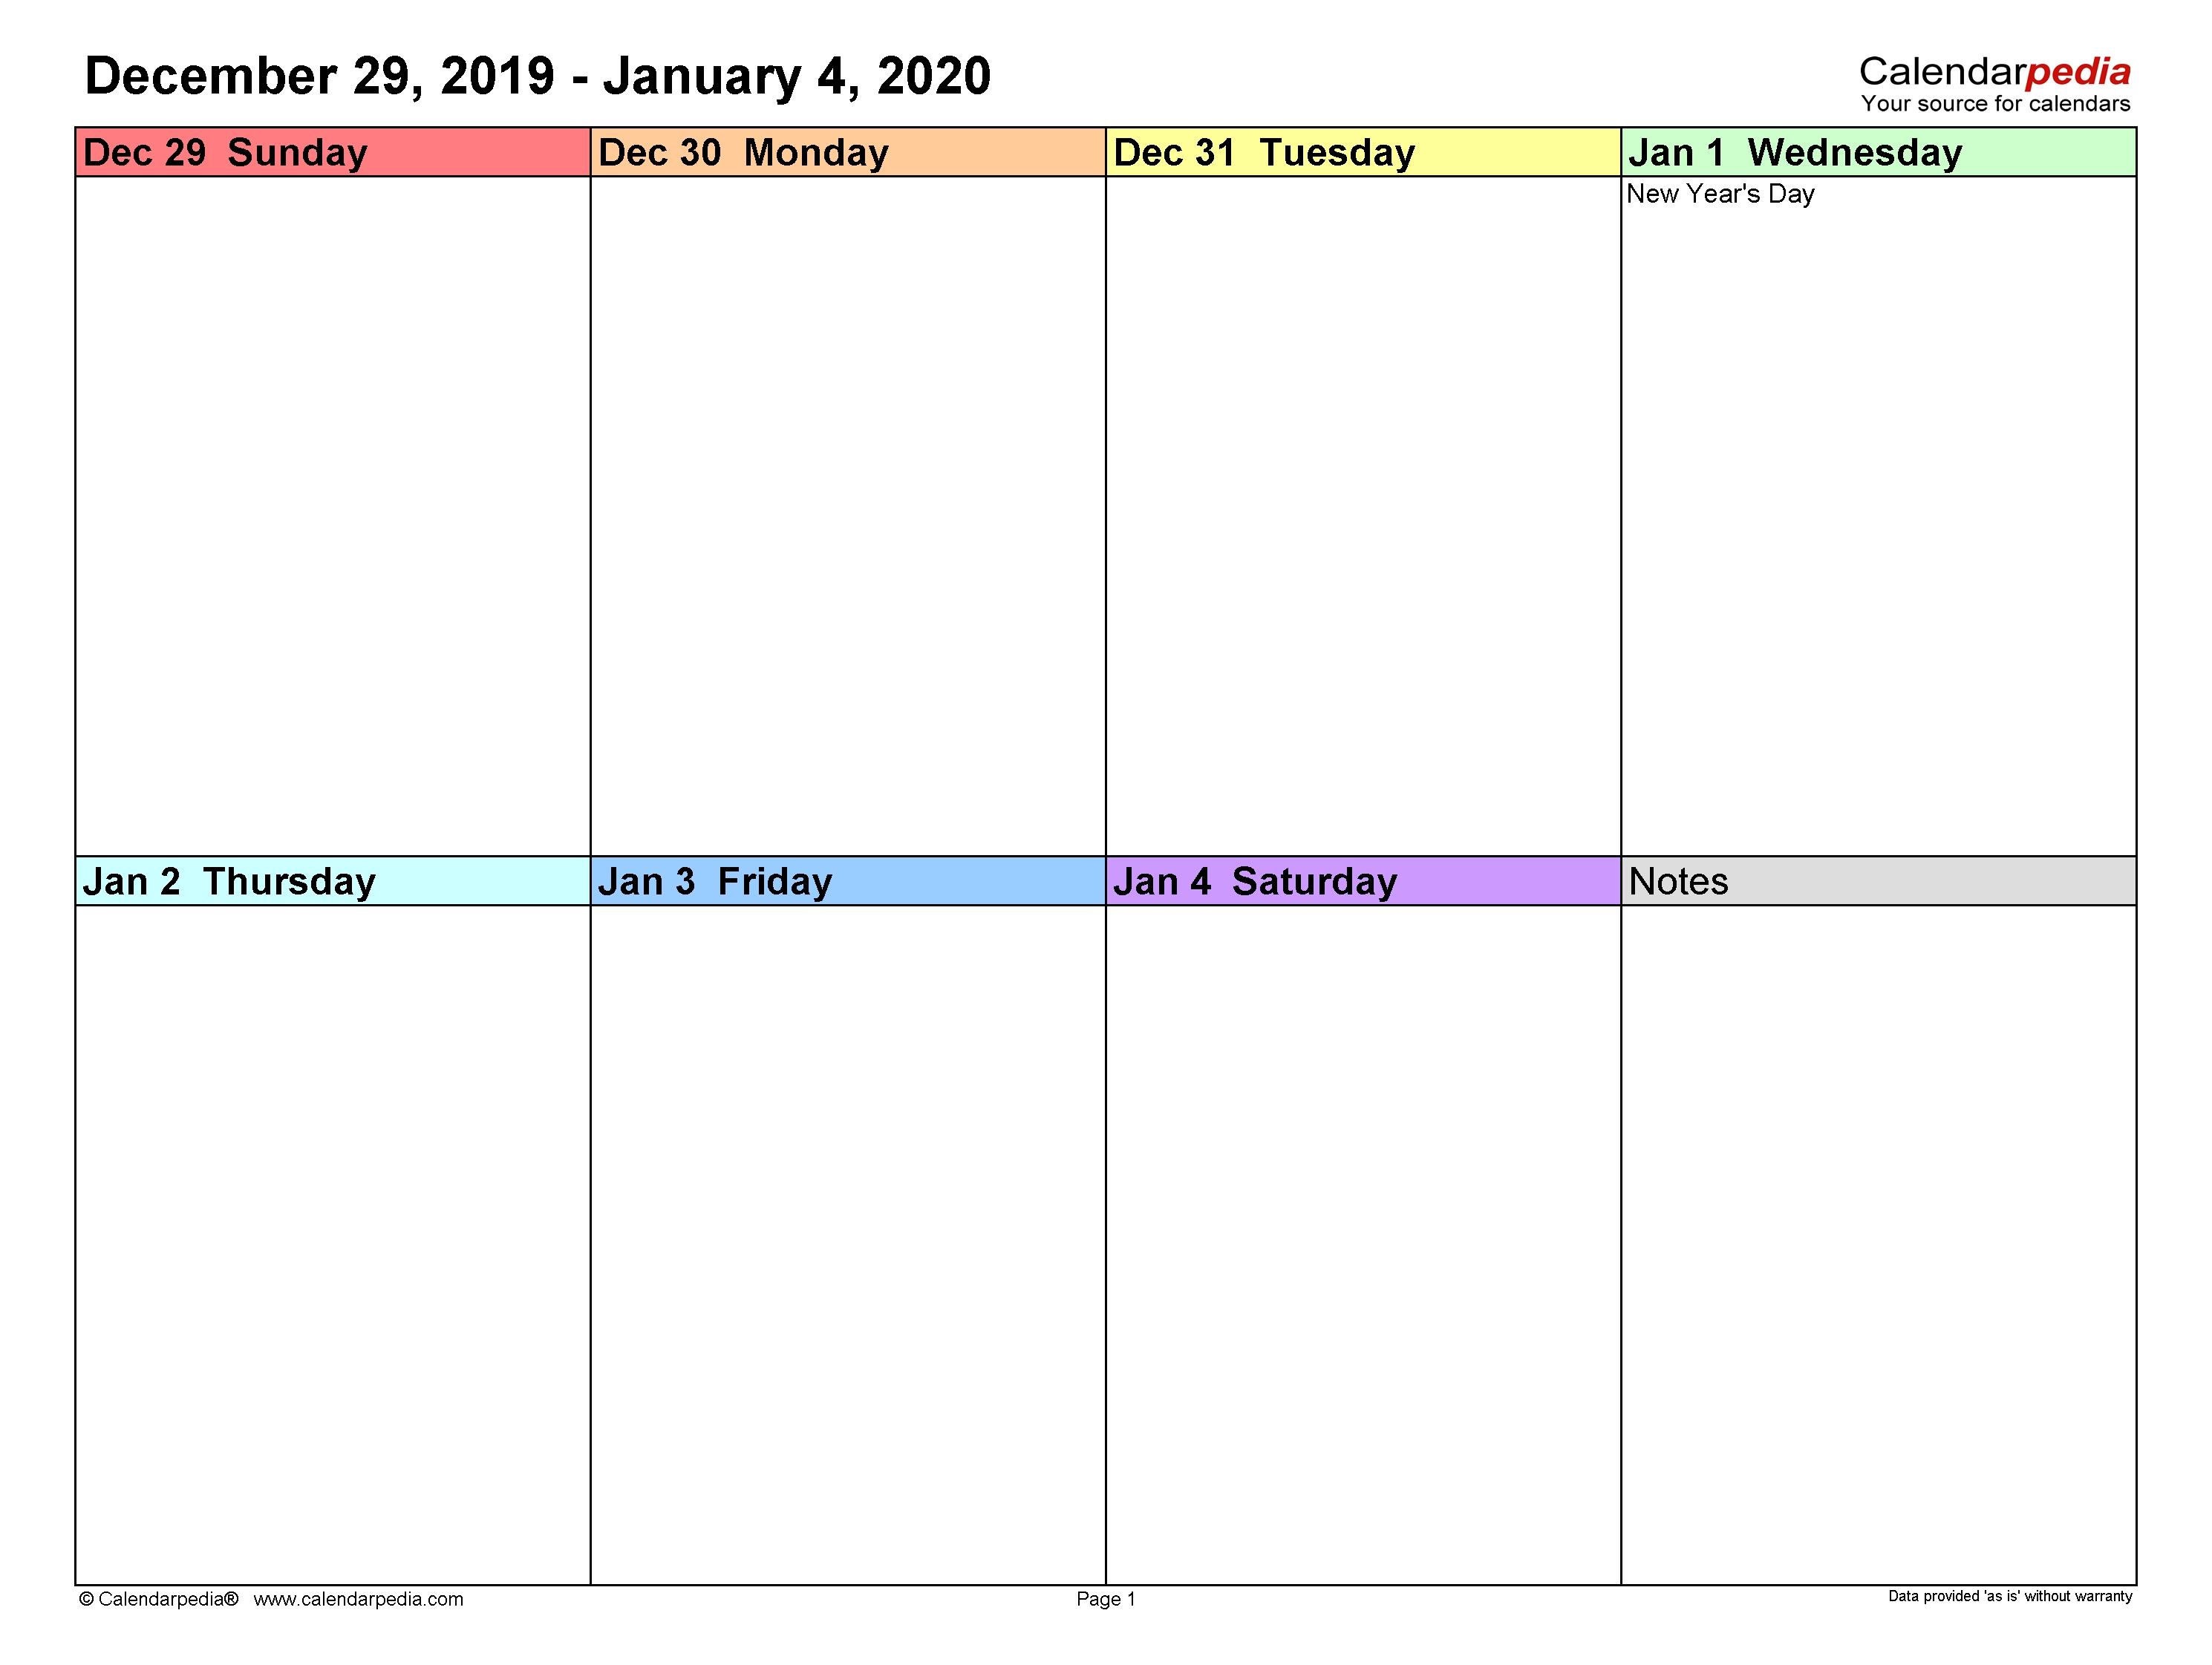 Weekly Calendars 2020 For Excel - 12 Free Printable Templates 2 Week Calendar Template Excel